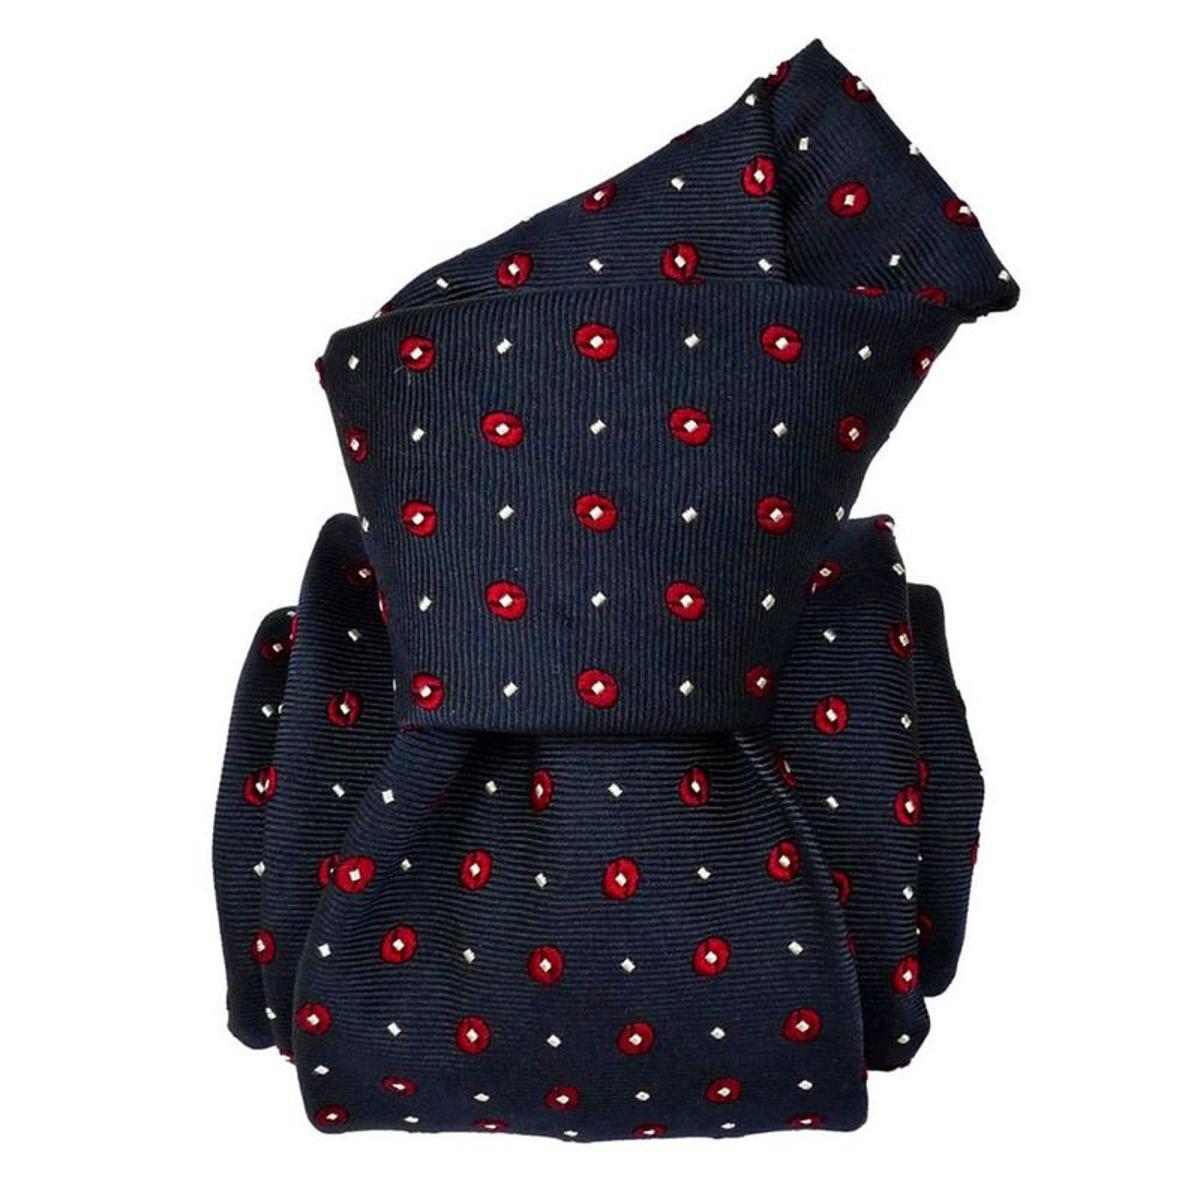 Cravate luxe soie luxe 3 plis